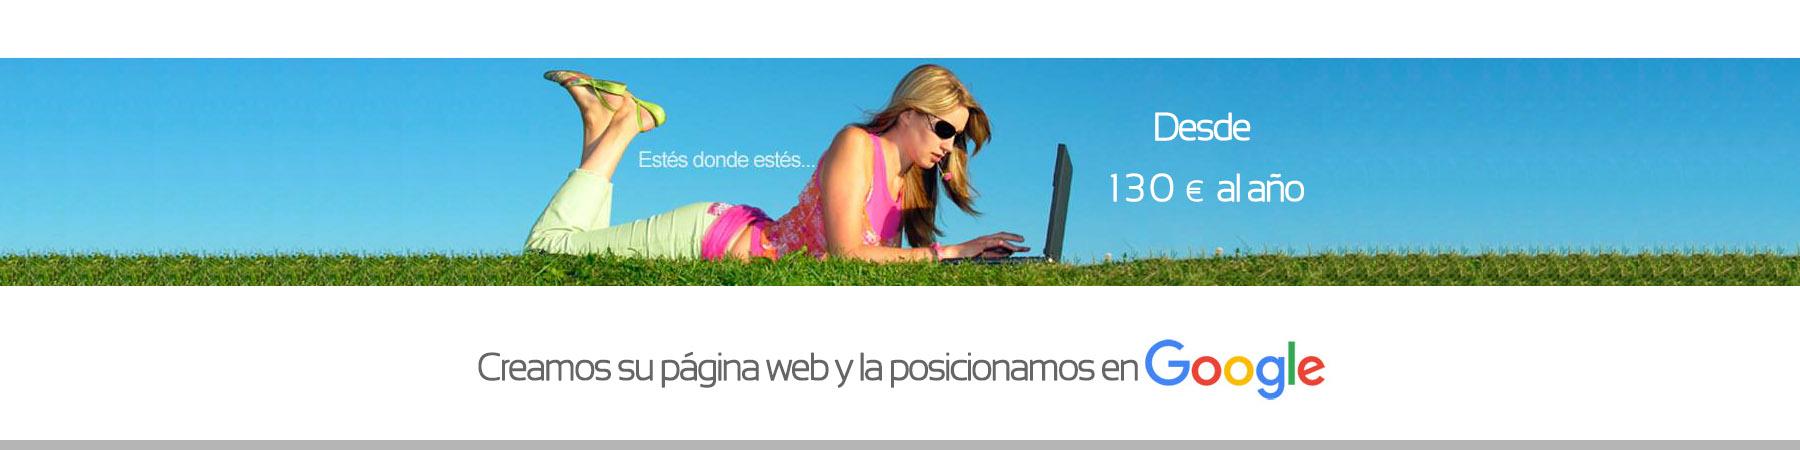 diseño paginas web barcelona, diseño pagina web baix llobregat